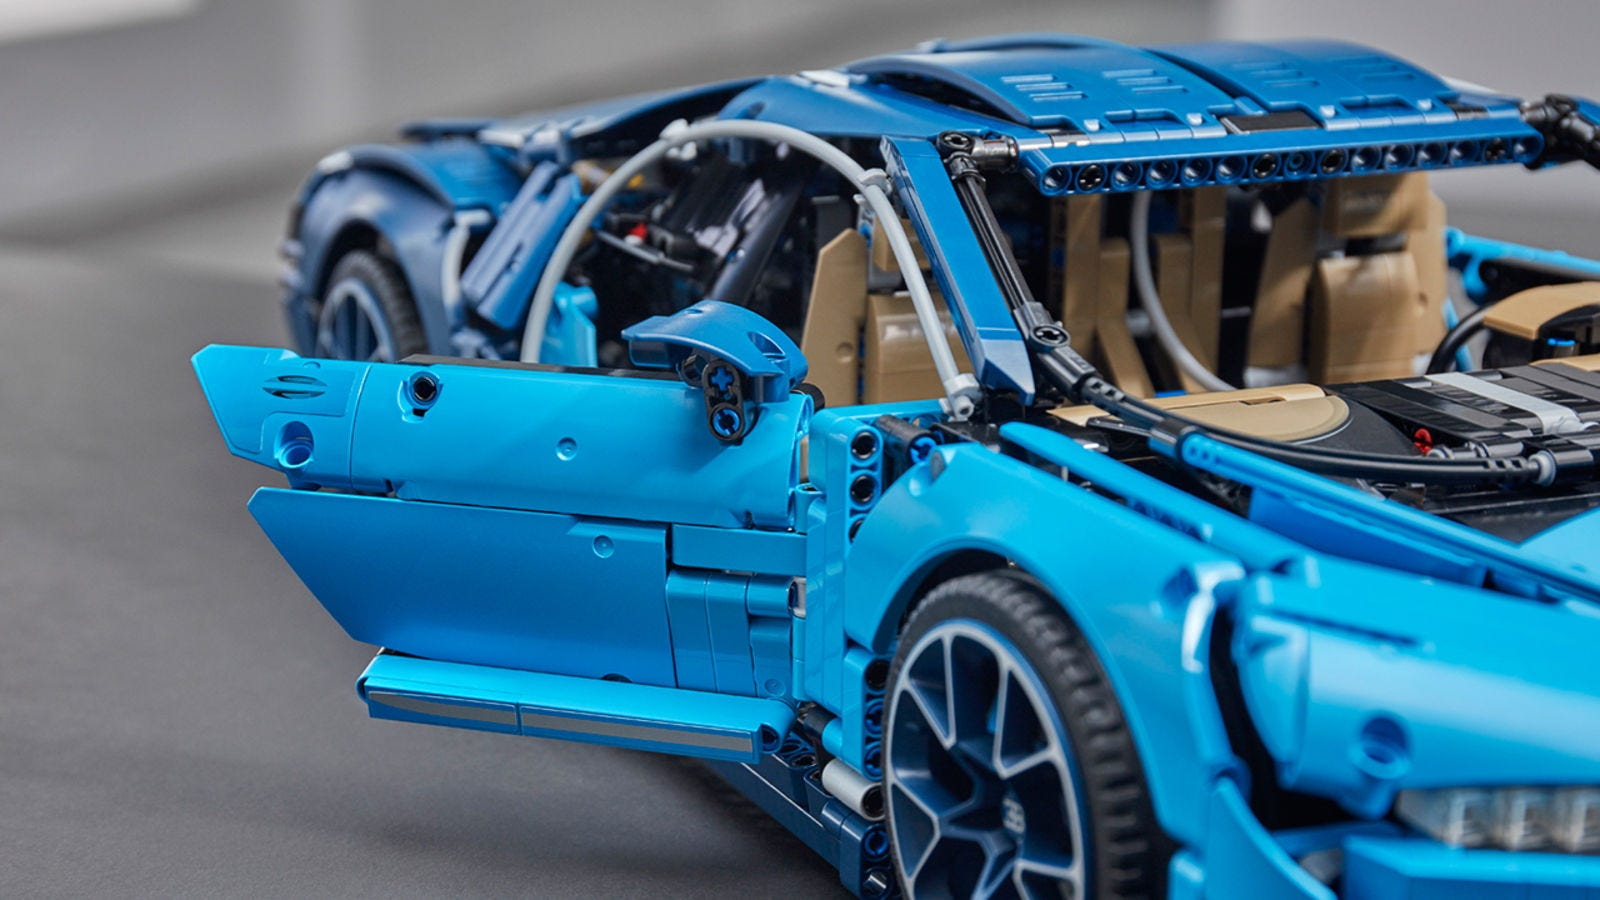 Illustration for article titled Puedes esperar unos años a tener un Tesla, o construir este impresionante Bugatti em/emChiron de Legoem/em